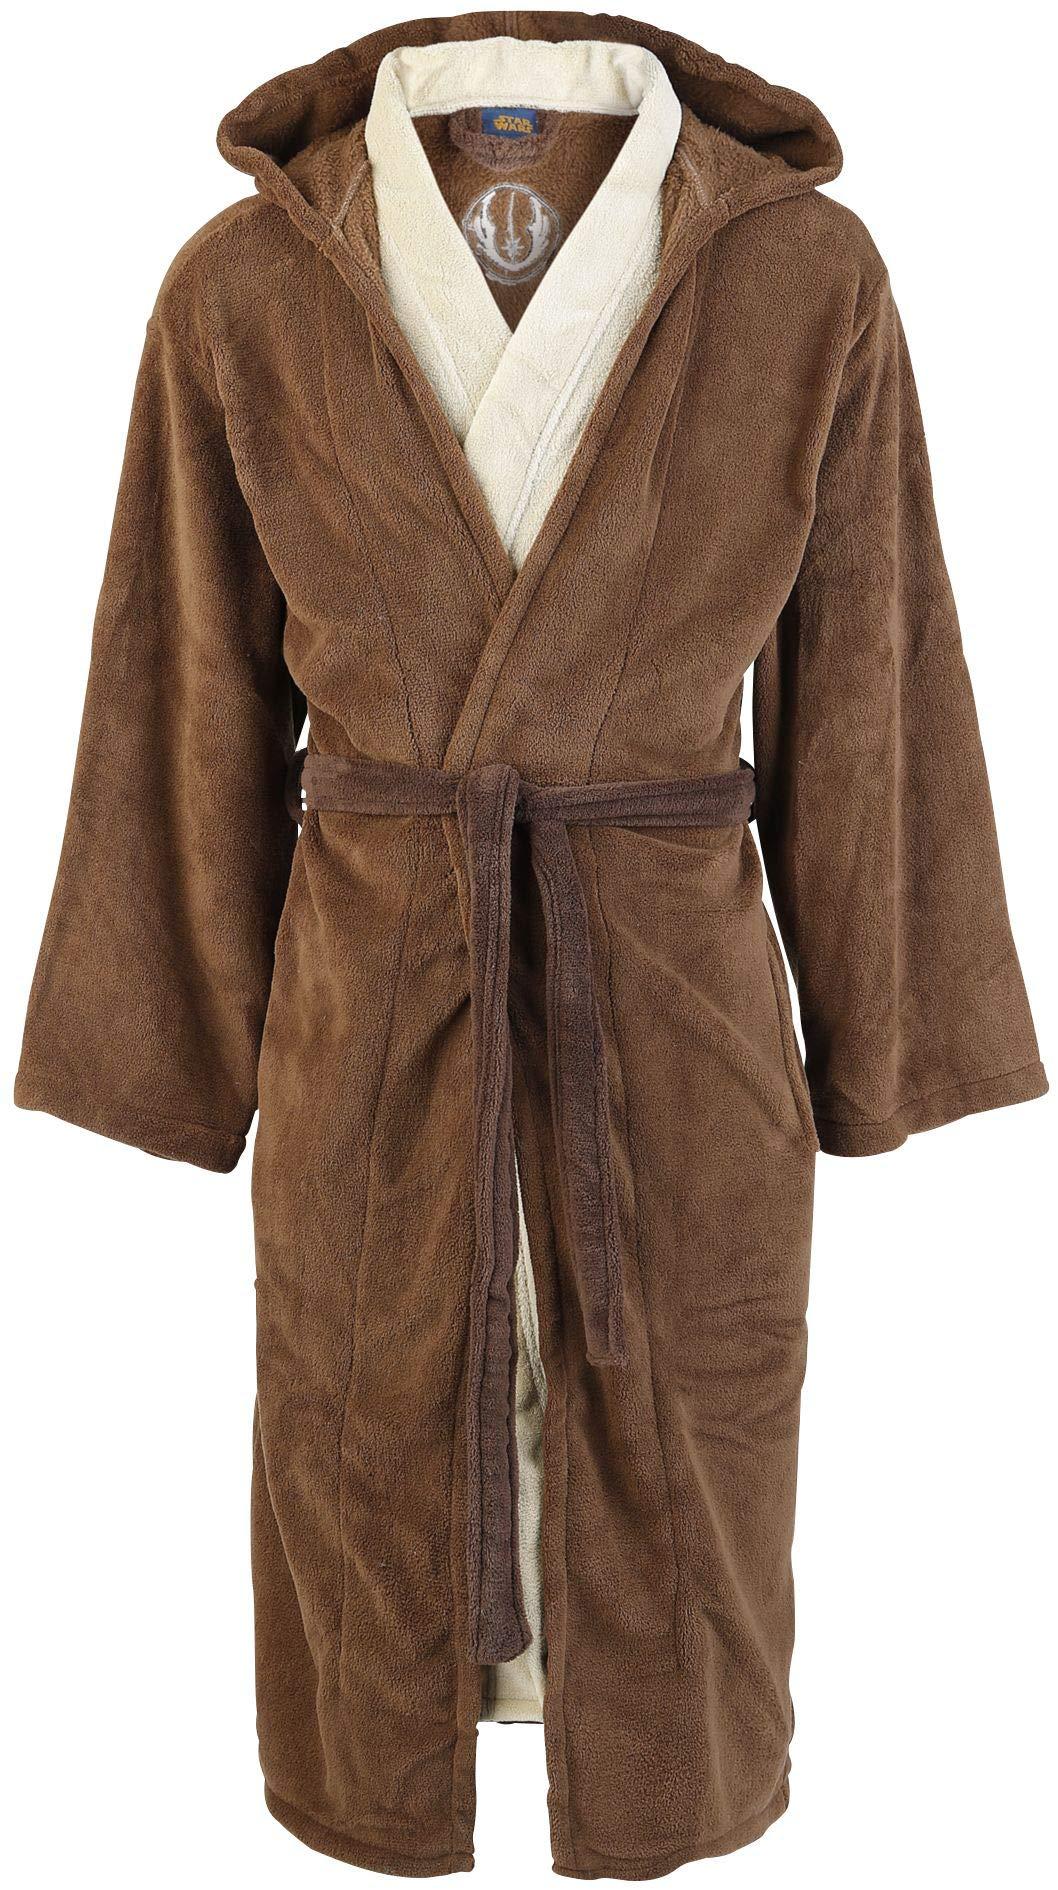 Star Wars Jedi-Ritter - mañana/de baño/casa tunicados product image